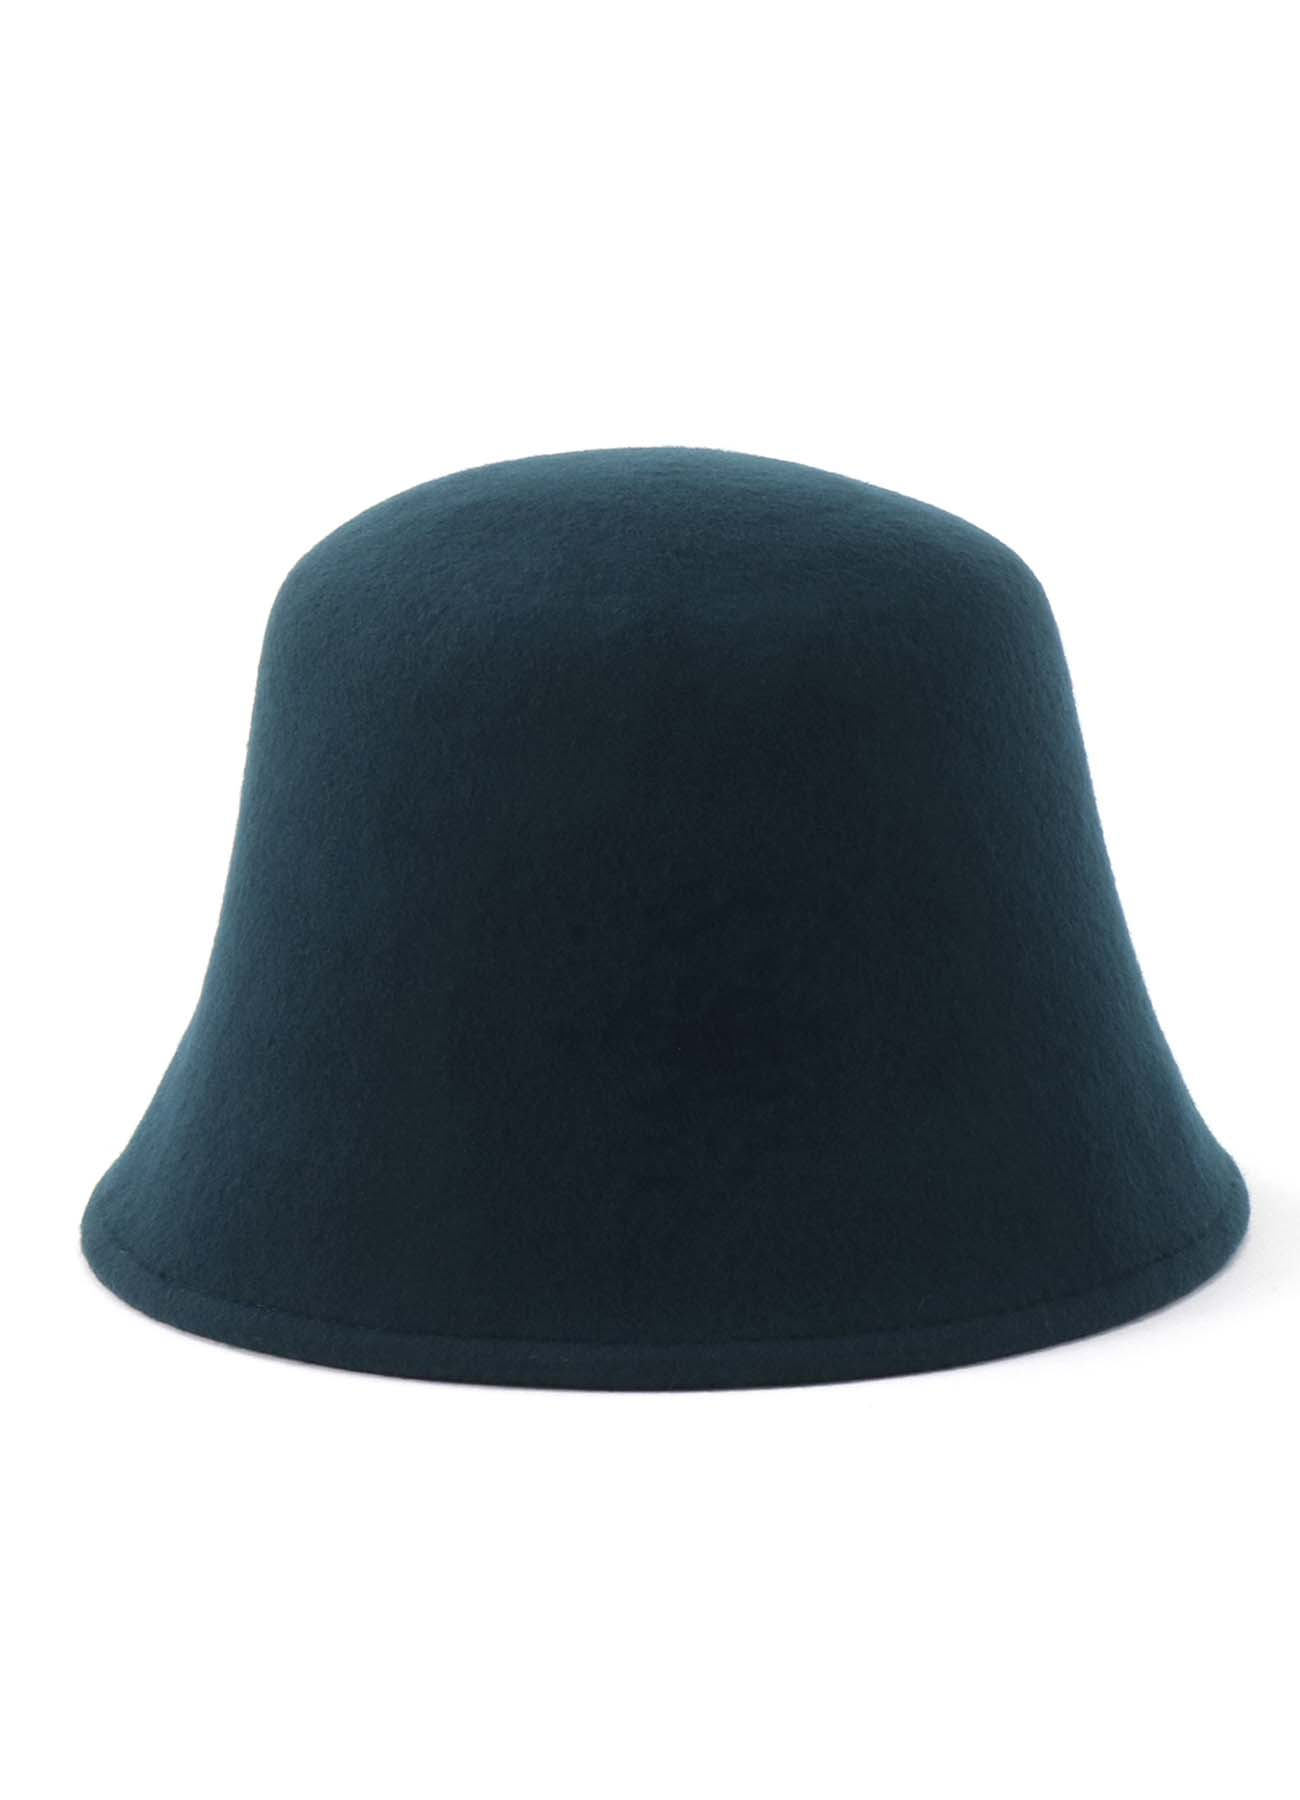 Y'SPINK羊毛提篮帽